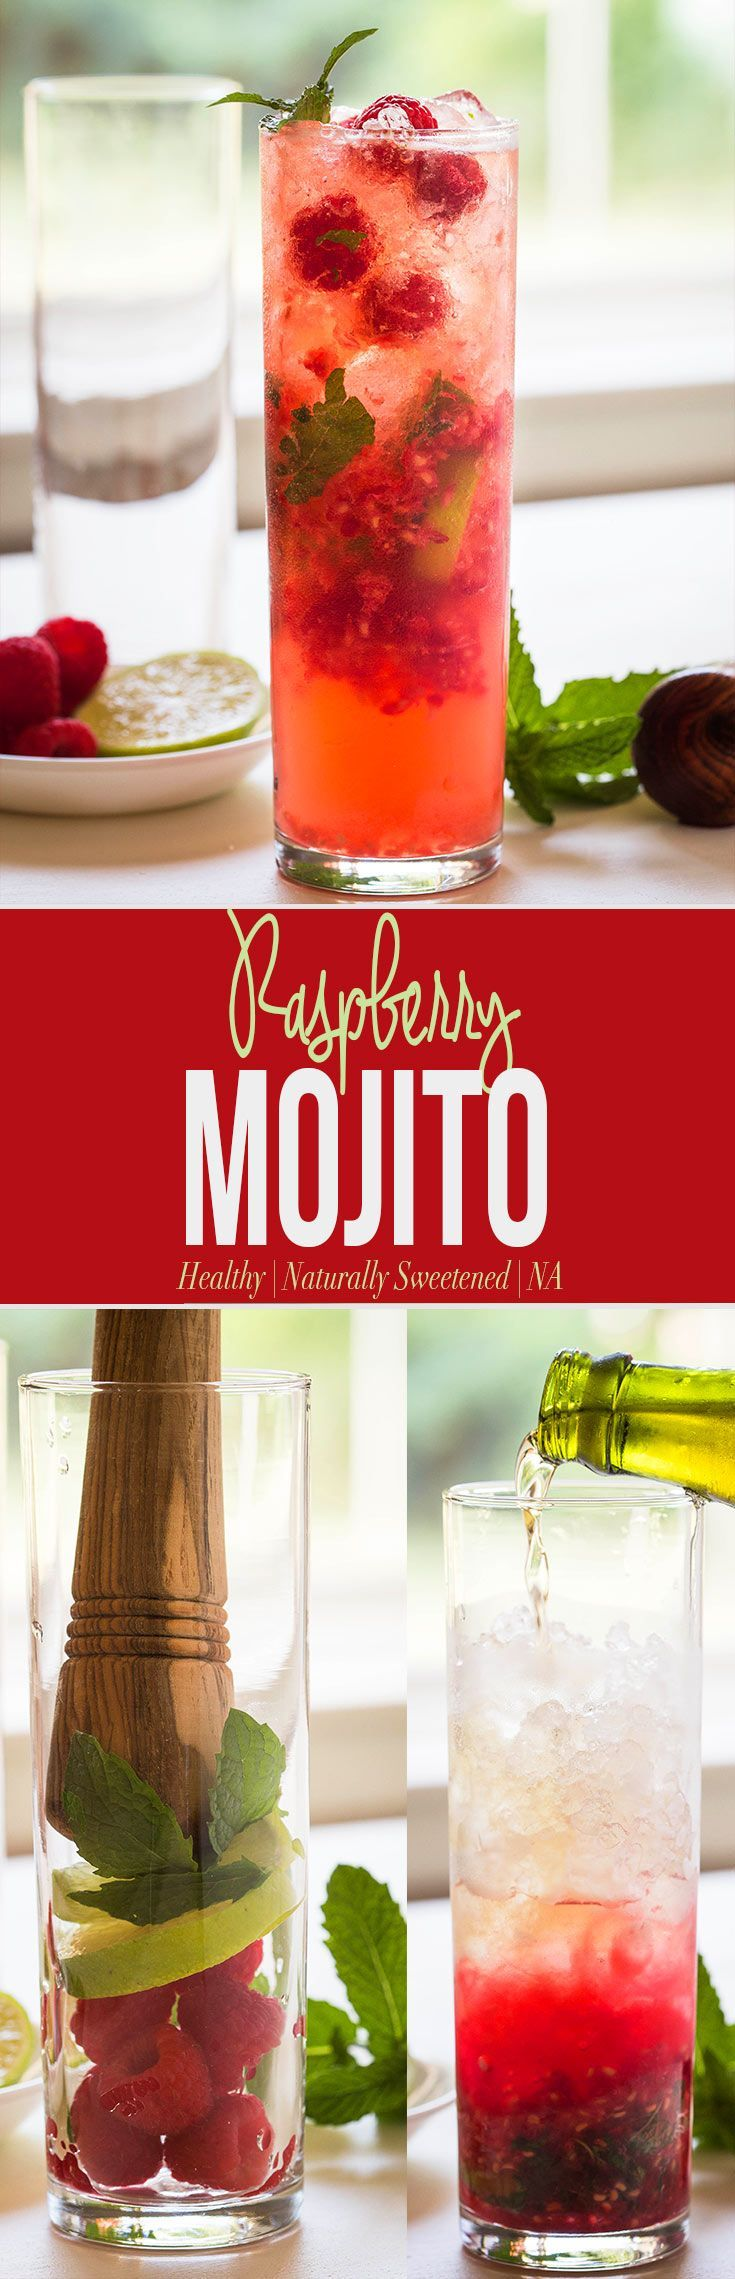 Healthy Naturally Sweetened Raspberry Mojito Recipe Raspberry Mojito Mojito Recipe Non Alcoholic Drinks